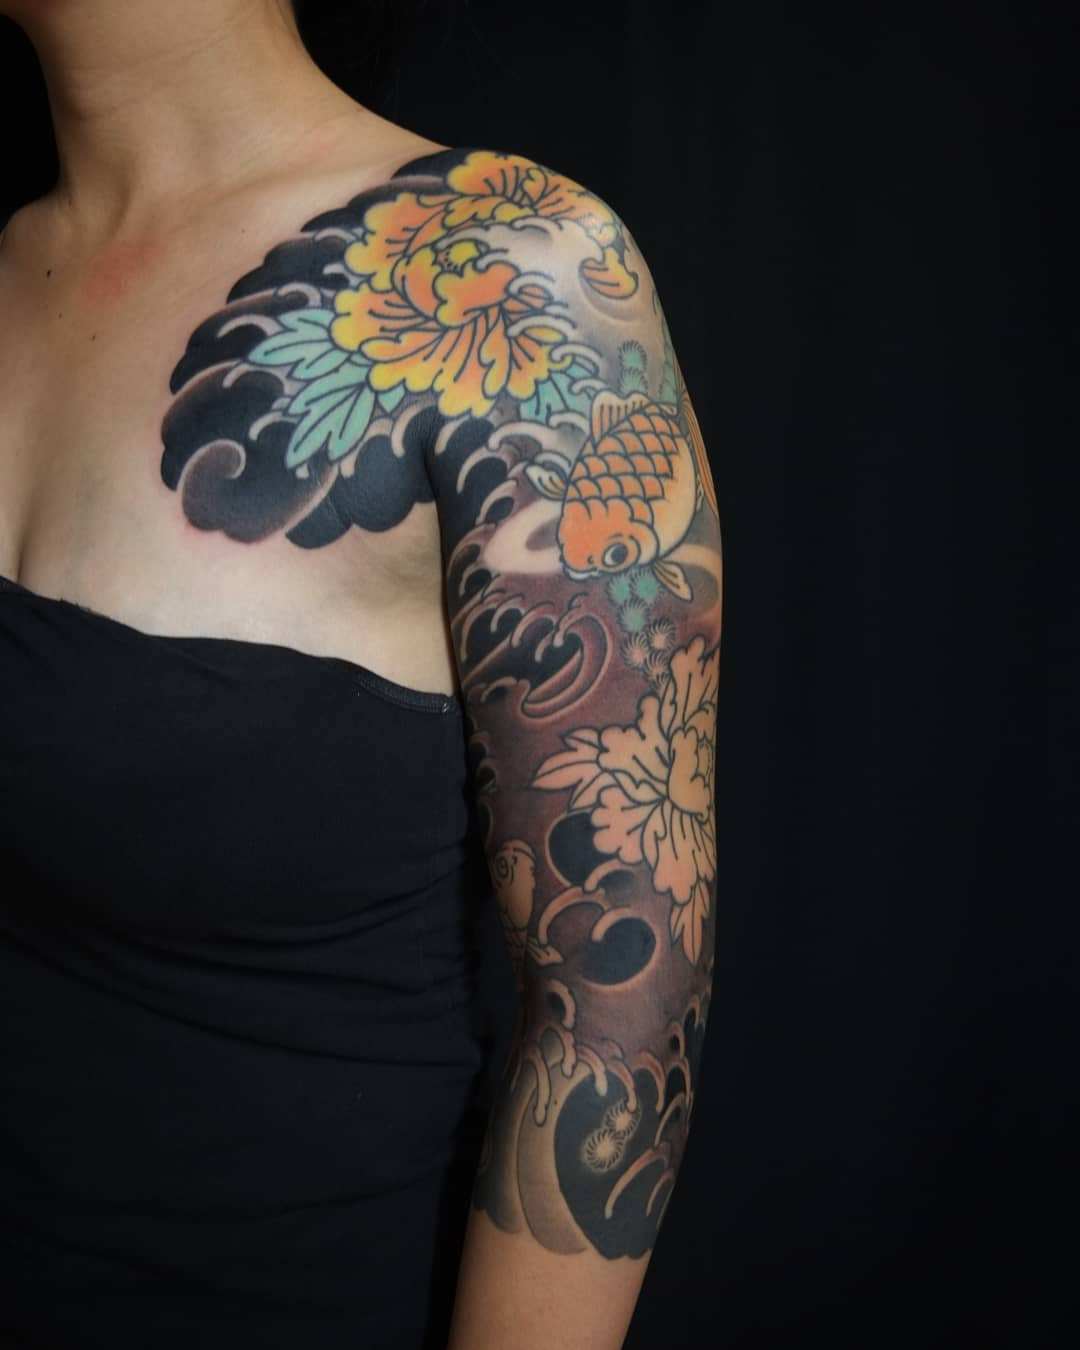 Kingyo sleeve tattoo